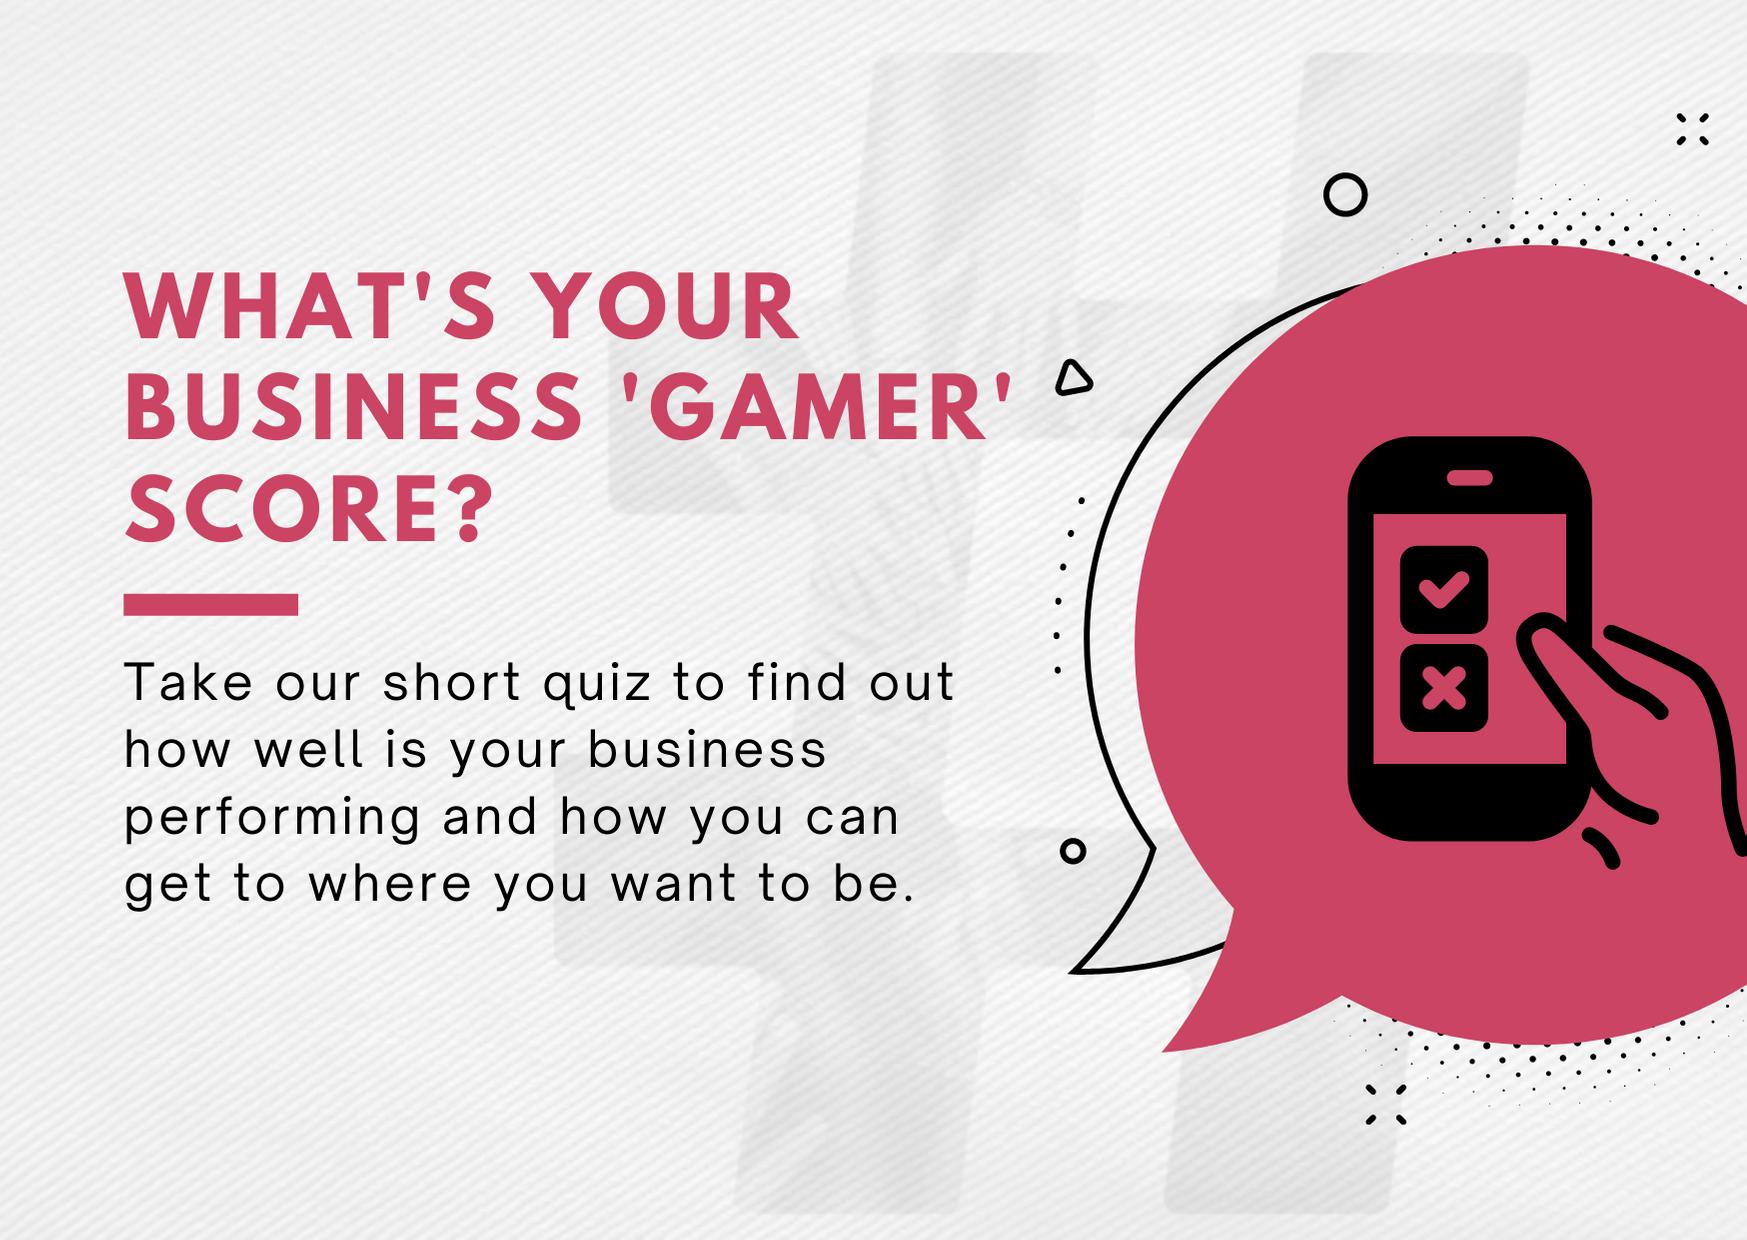 Business Gamer quiz